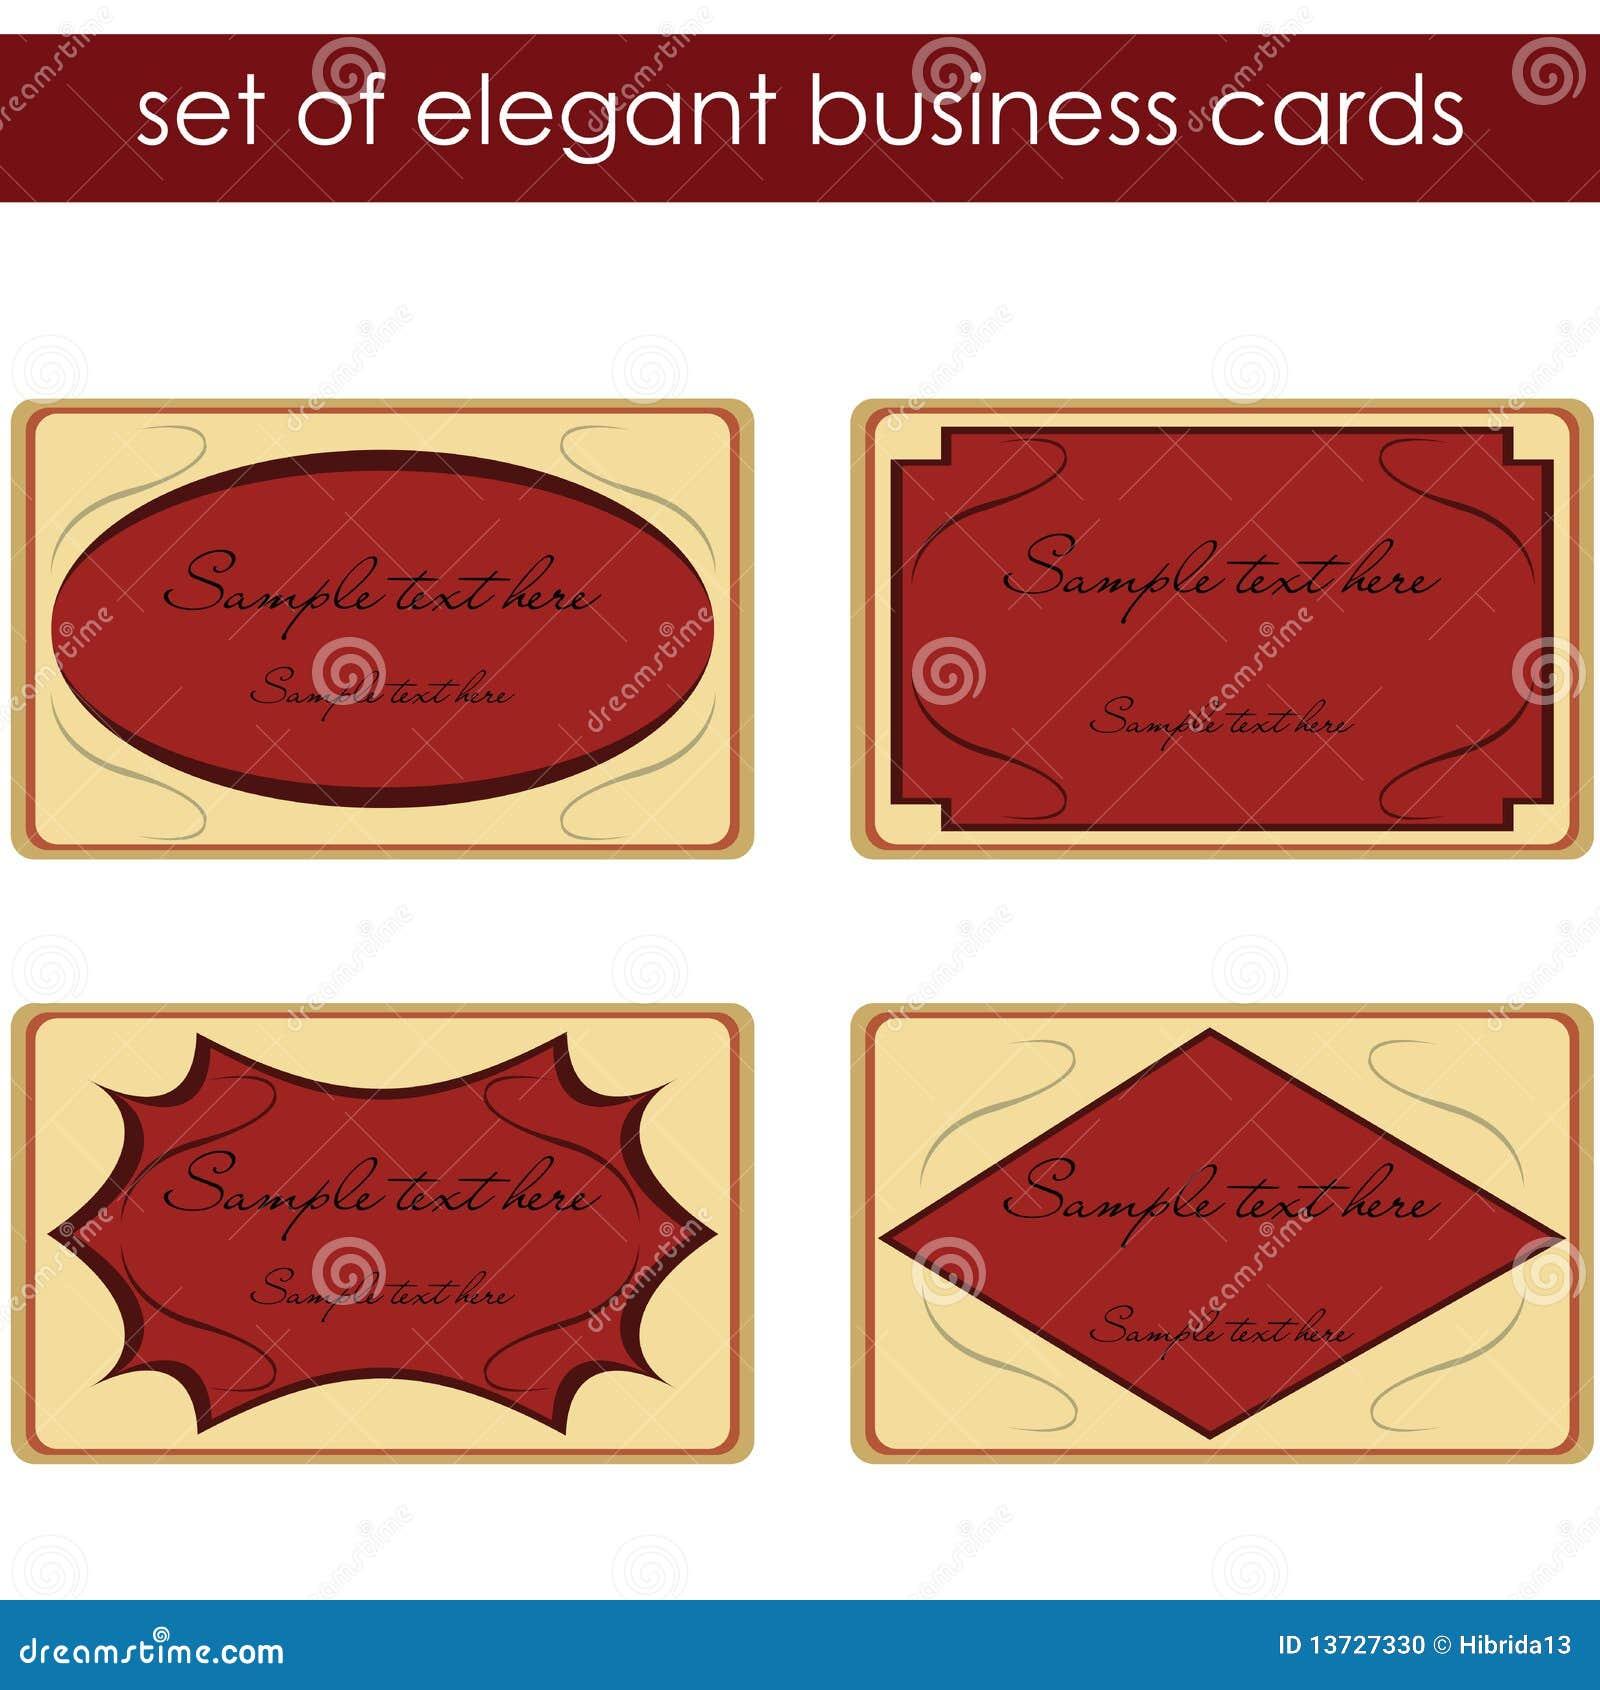 Elegant Business Cards Stock Image